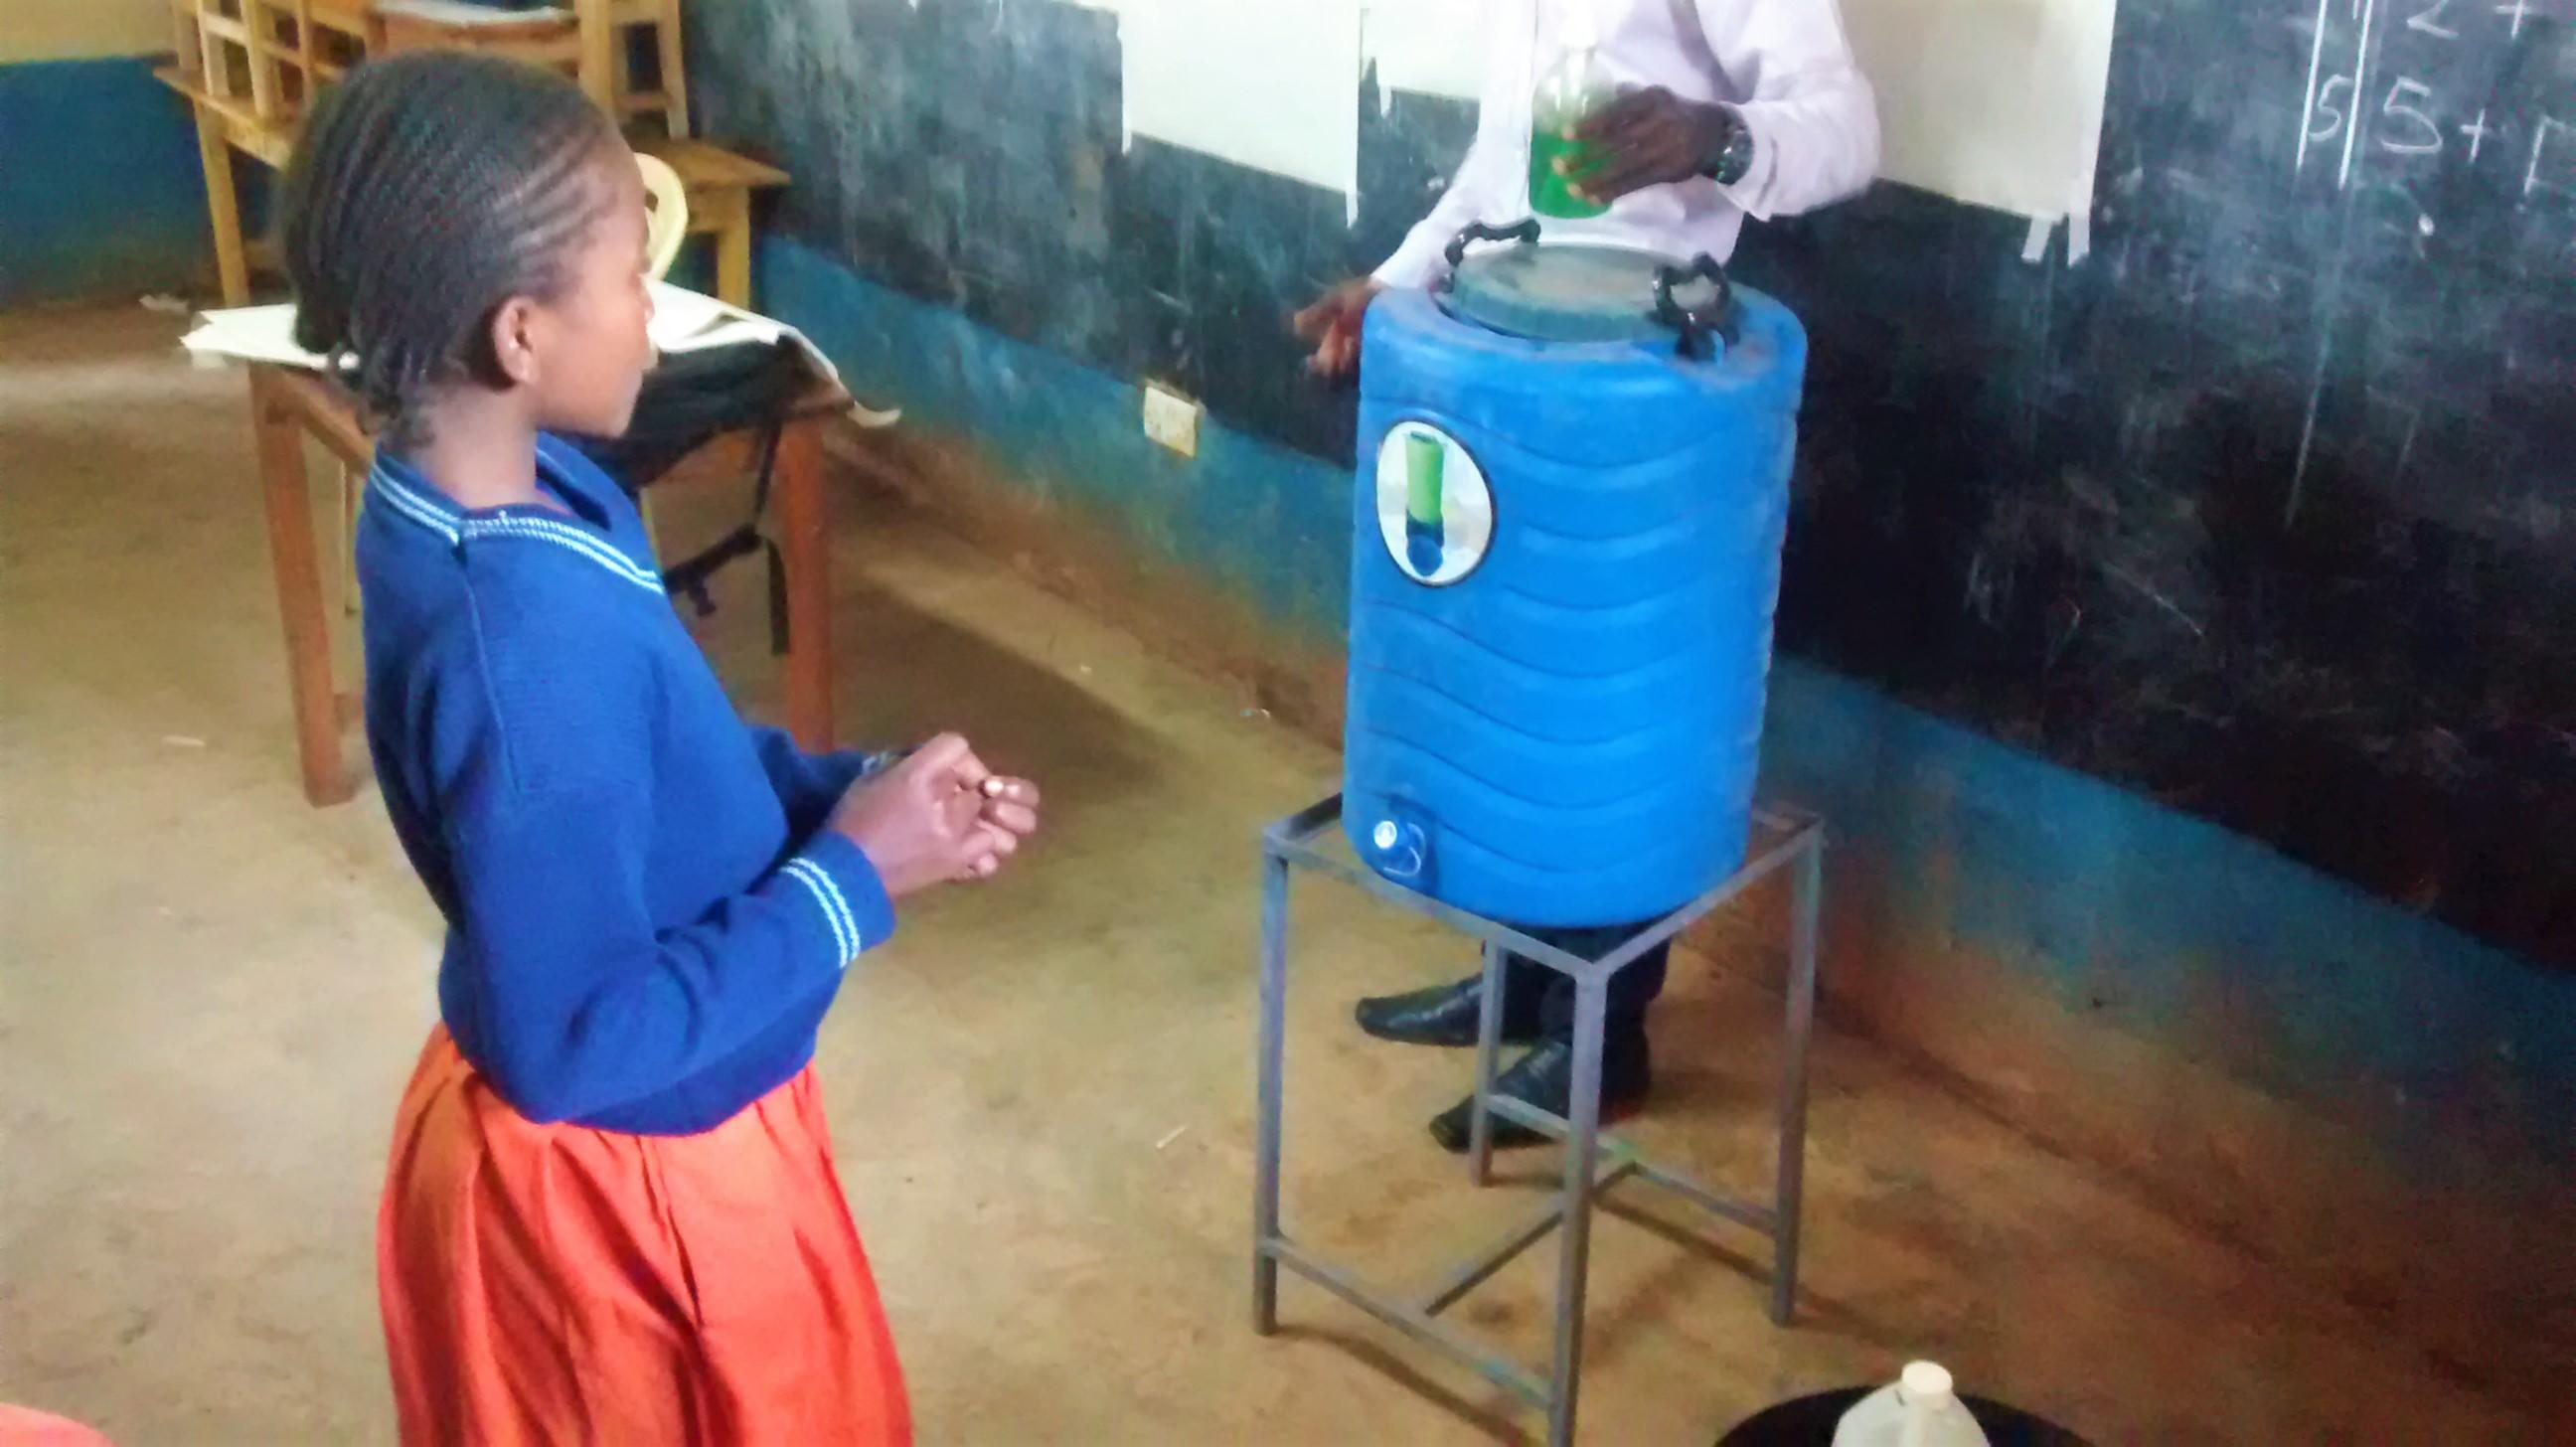 10 kenya4674 hand-washing demonstration